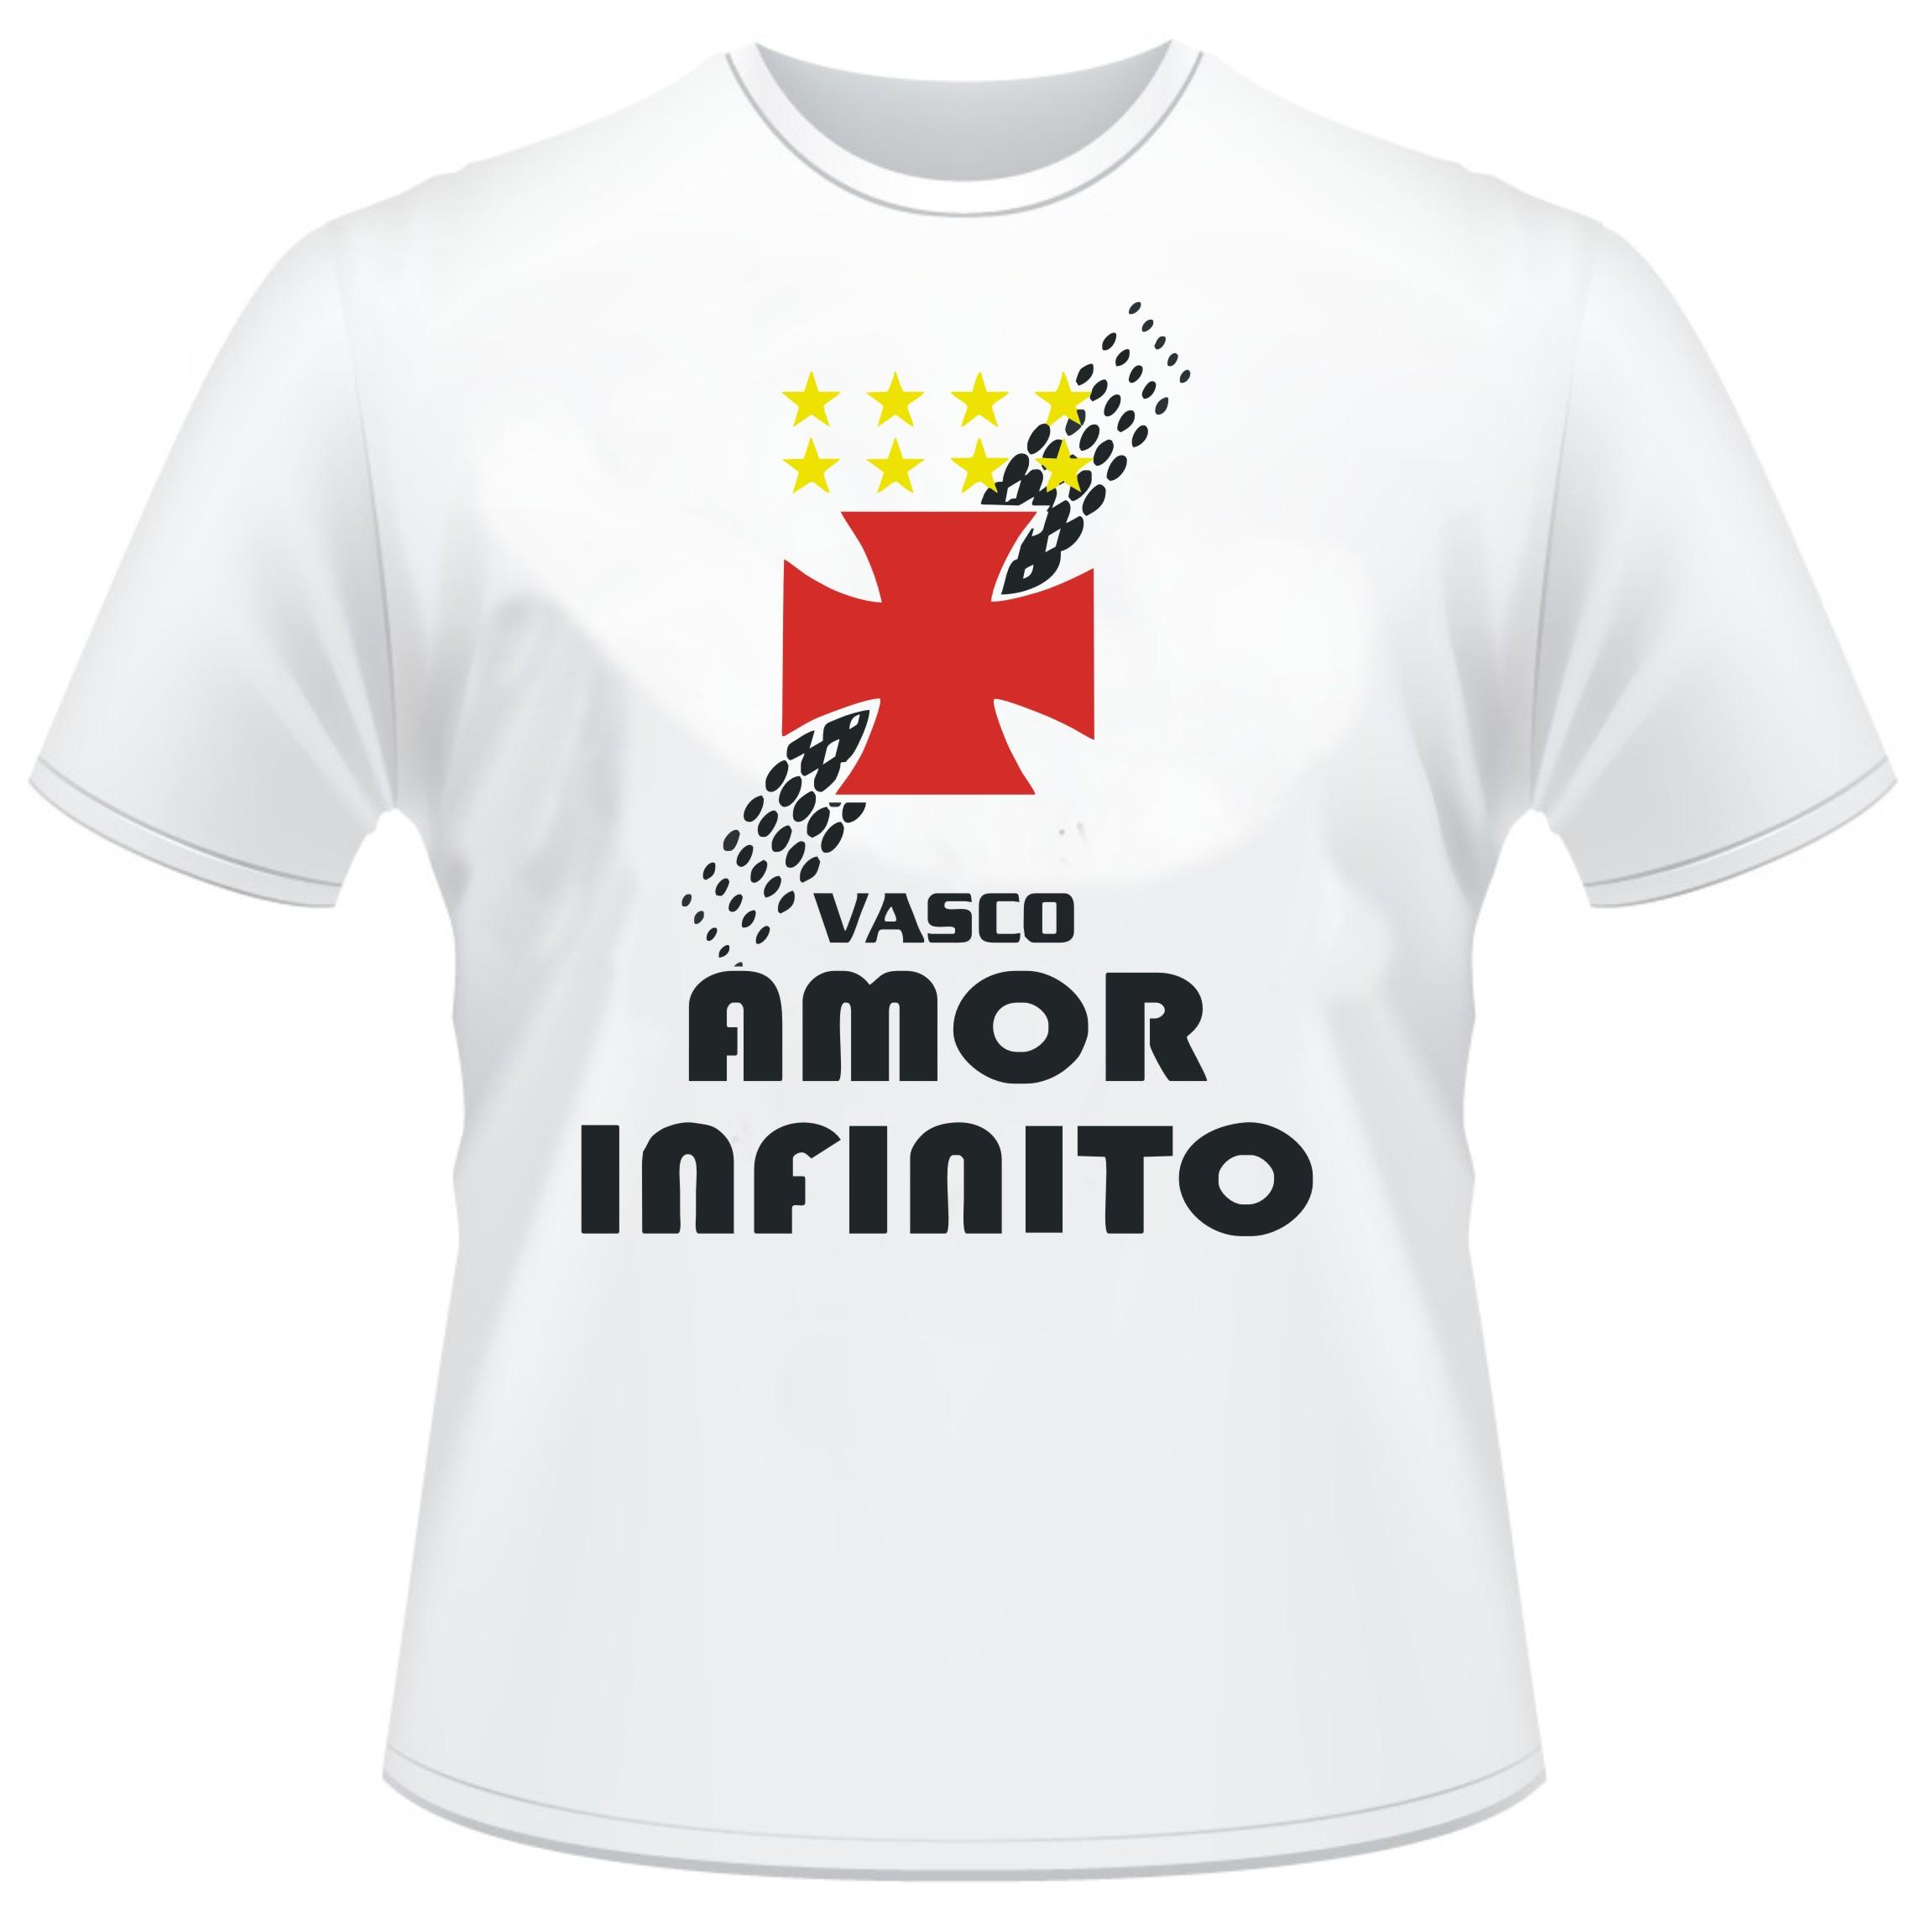 2308e780b692c Camiseta Vasco Amor Infinito no Elo7